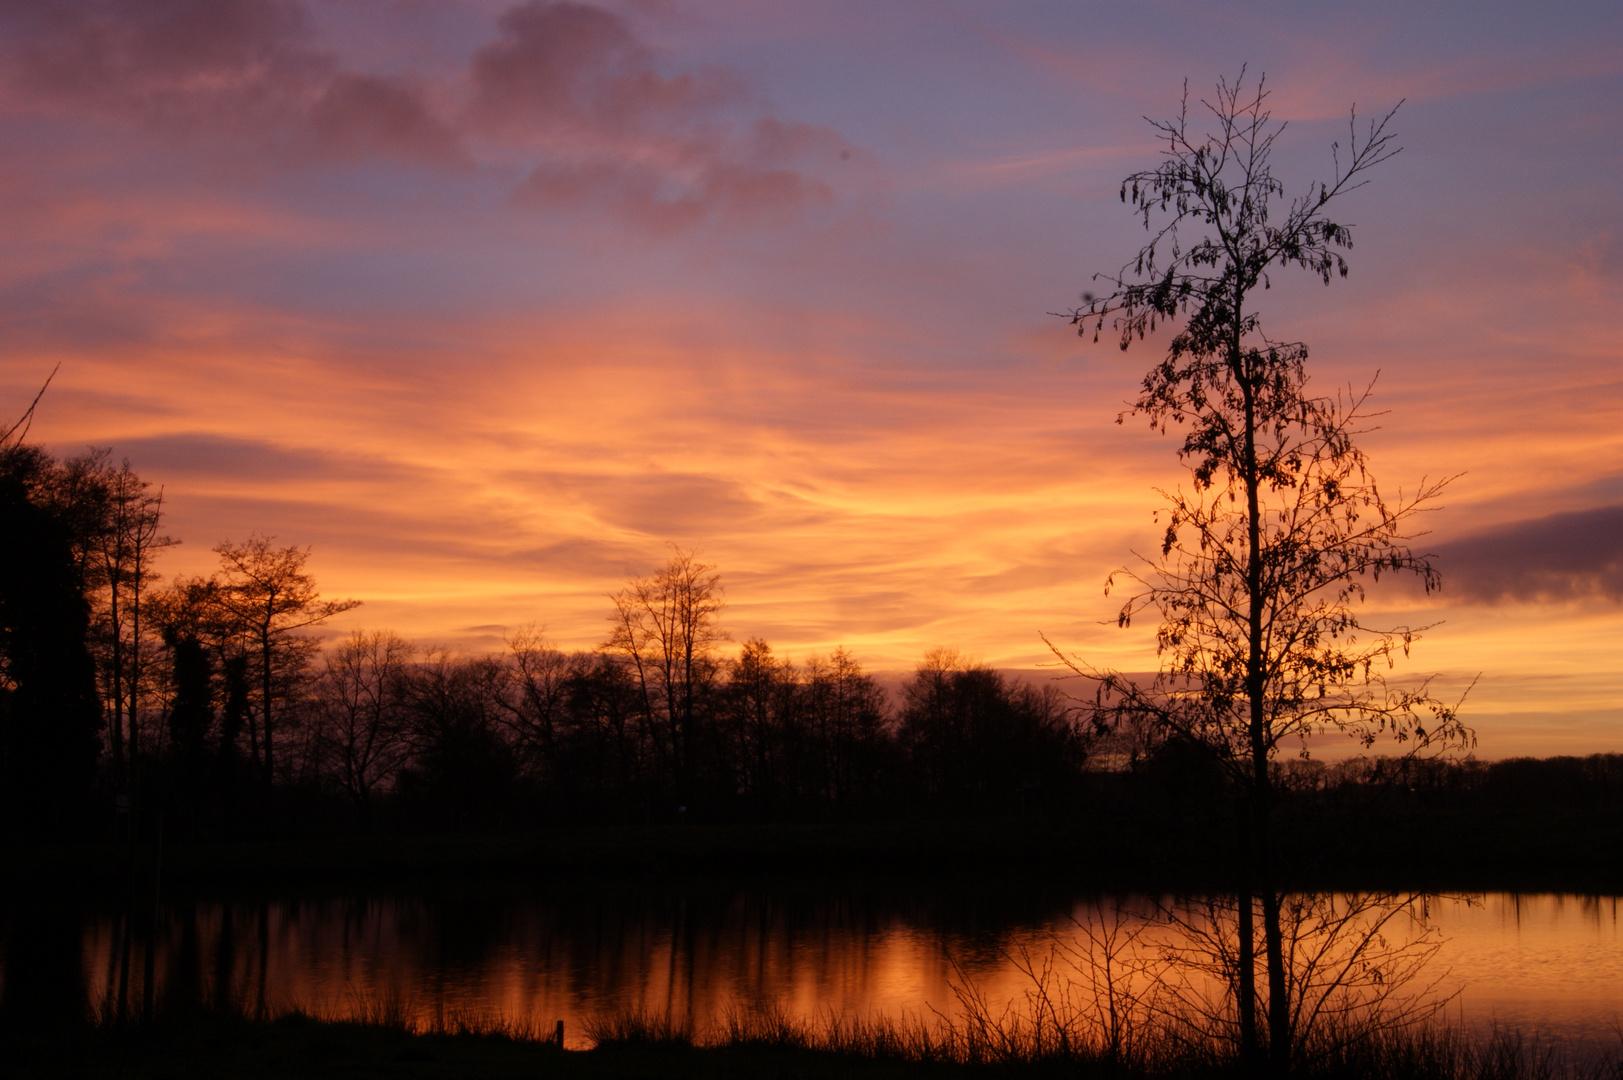 Sonnenuntergang am Biotop